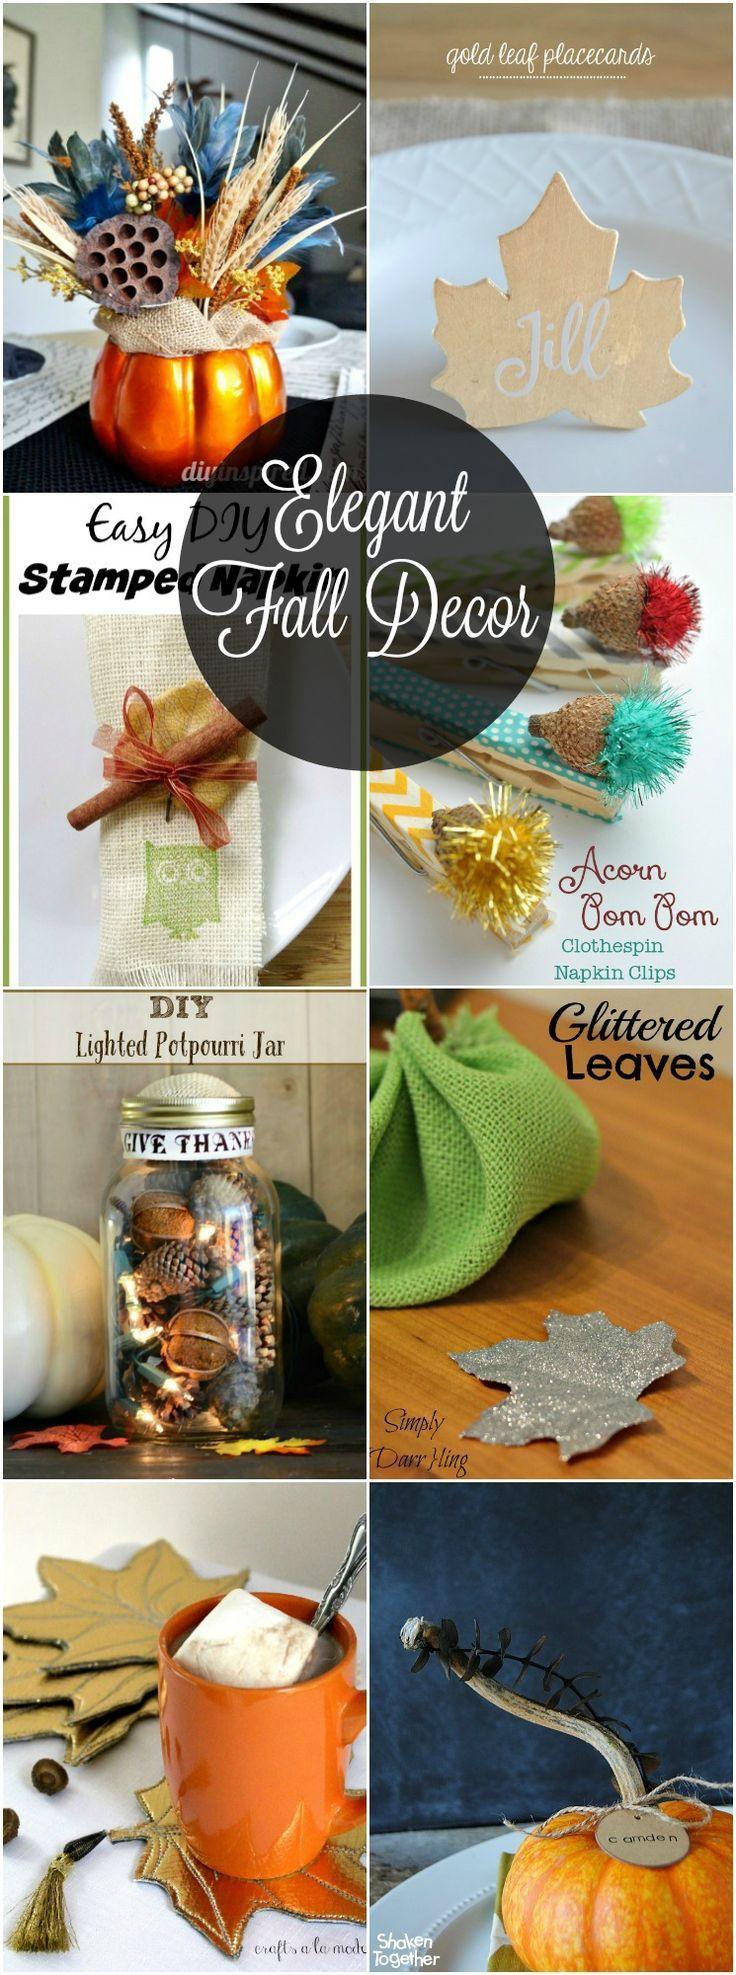 Elegant Fall Decor Ideas — brilliant for hosting Thanksgiving!